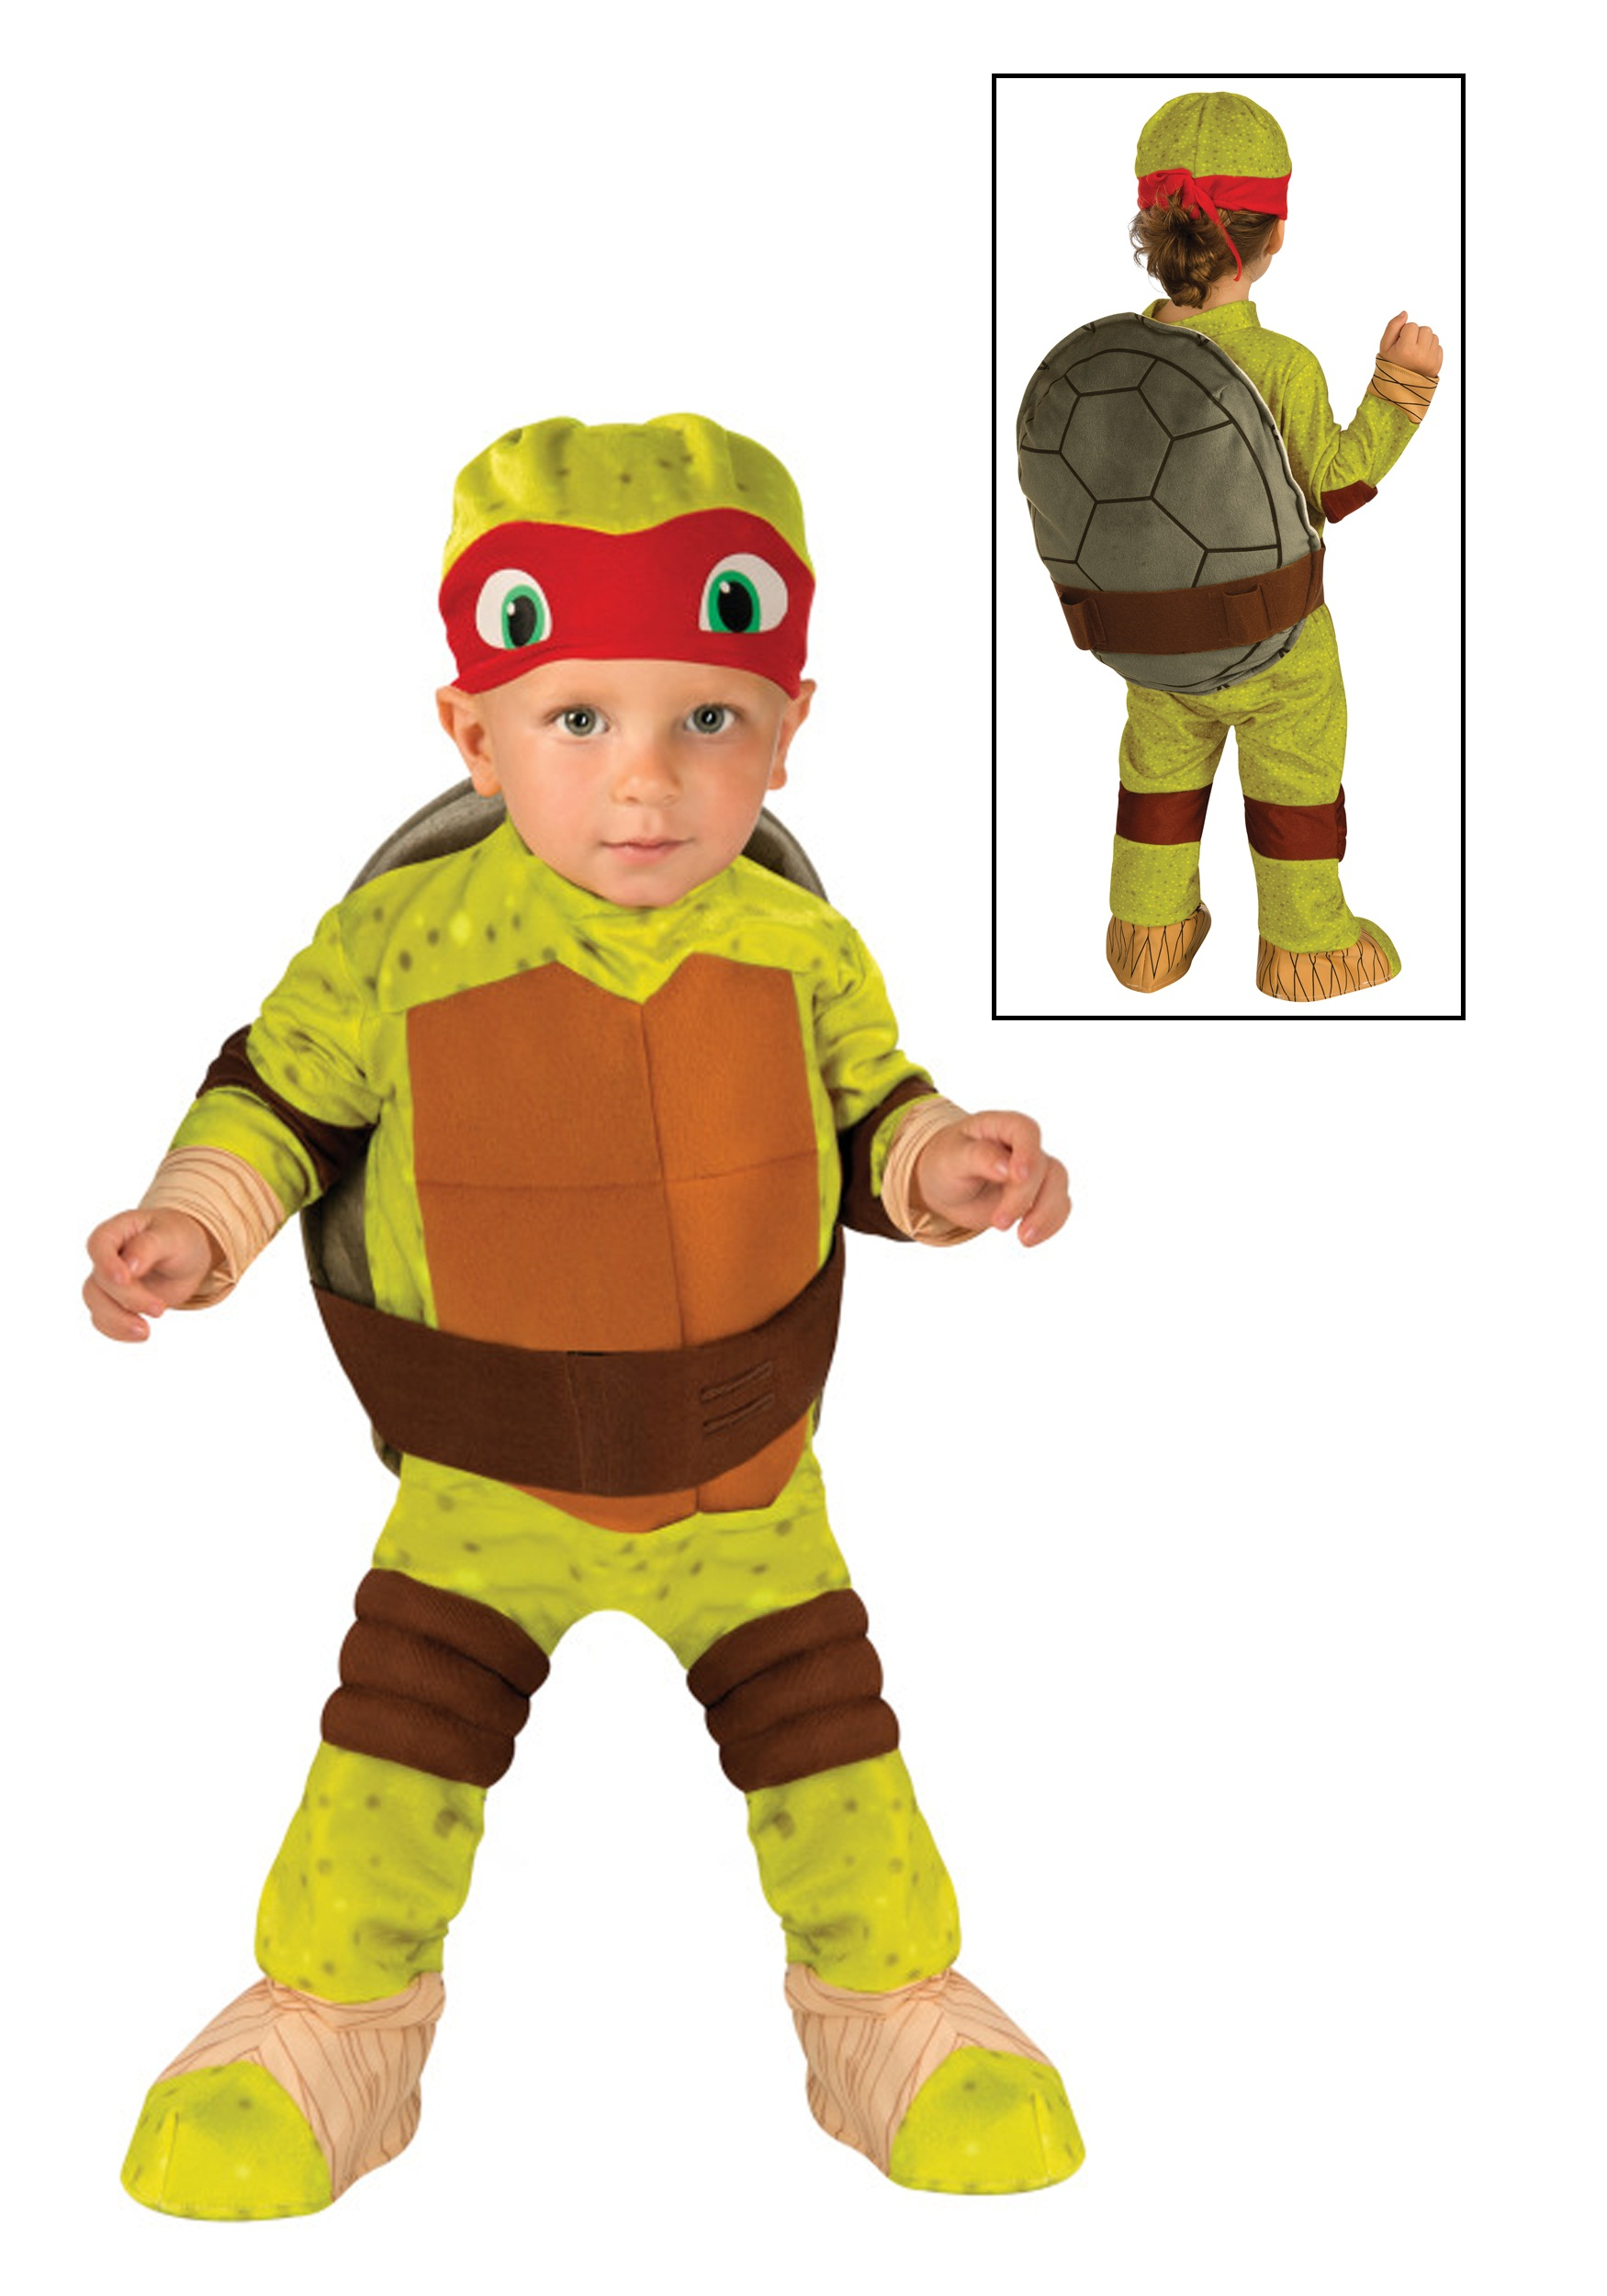 Toddler TMNT Raphael Costume  sc 1 st  Halloween Costumes & Toddler TMNT Raphael Costume - Halloween Costumes